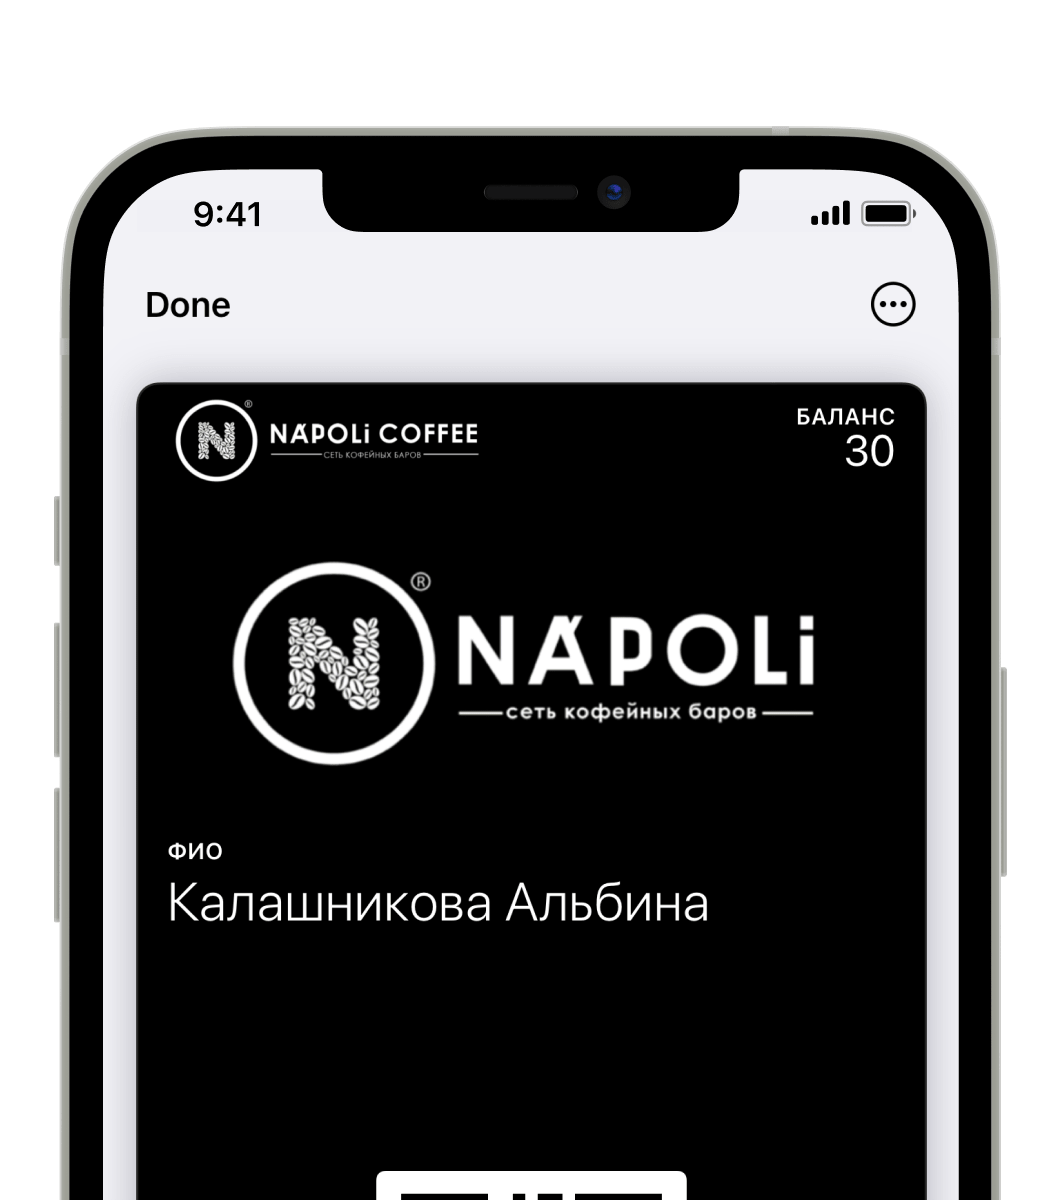 ЭЛЕКТРОННАЯ КАРТА napolicoffee в apple wallet